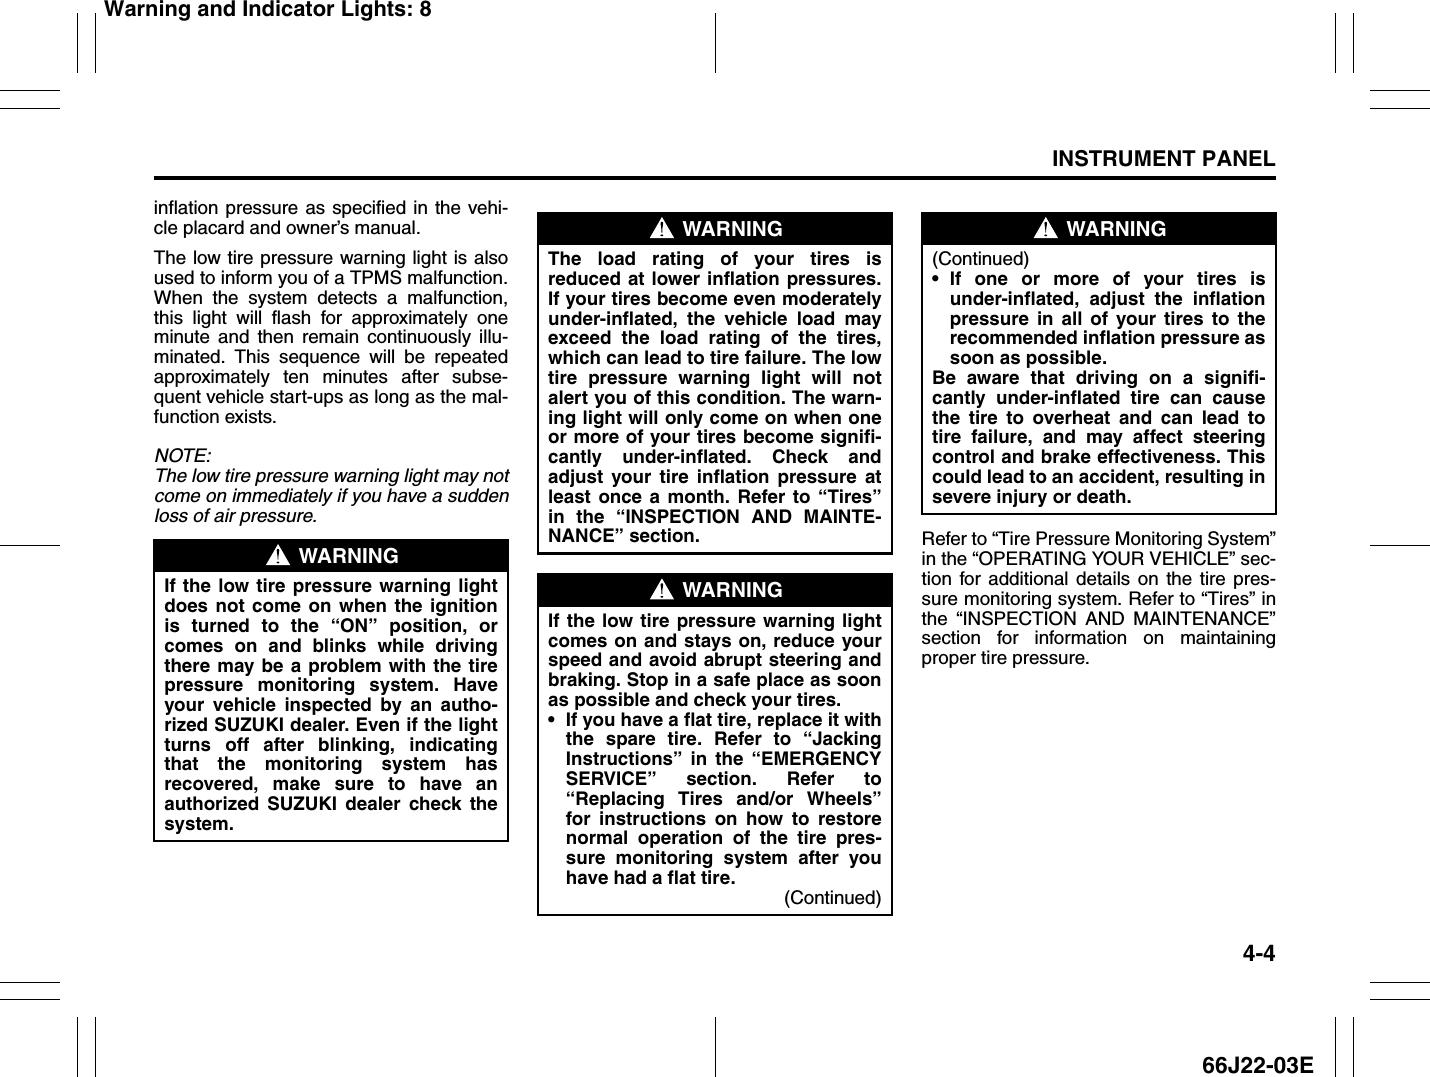 Suzuki 2008 Grand Vitara Owners Manual 15